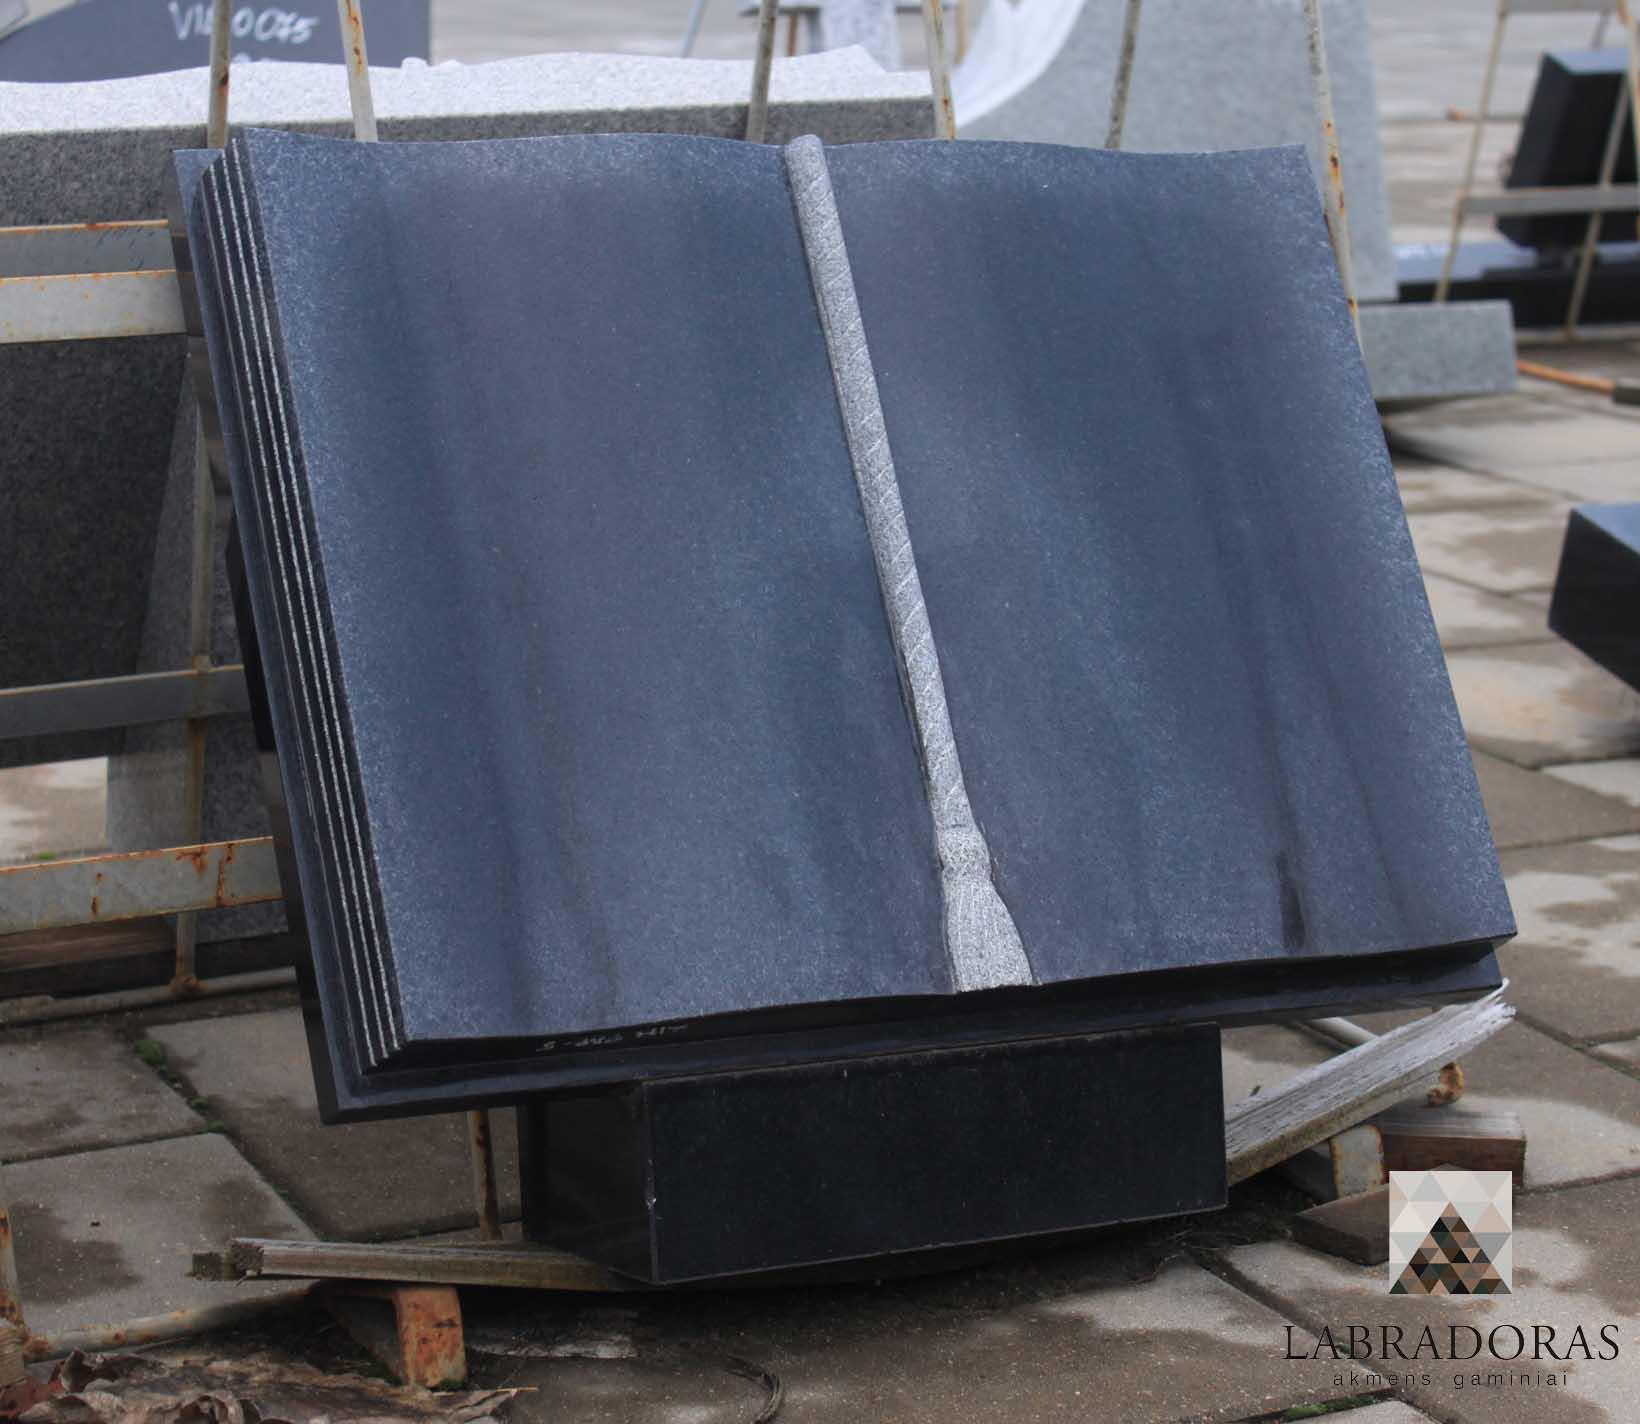 KIN PAP 5 - 300 - 58x45x8 - 30x16x10